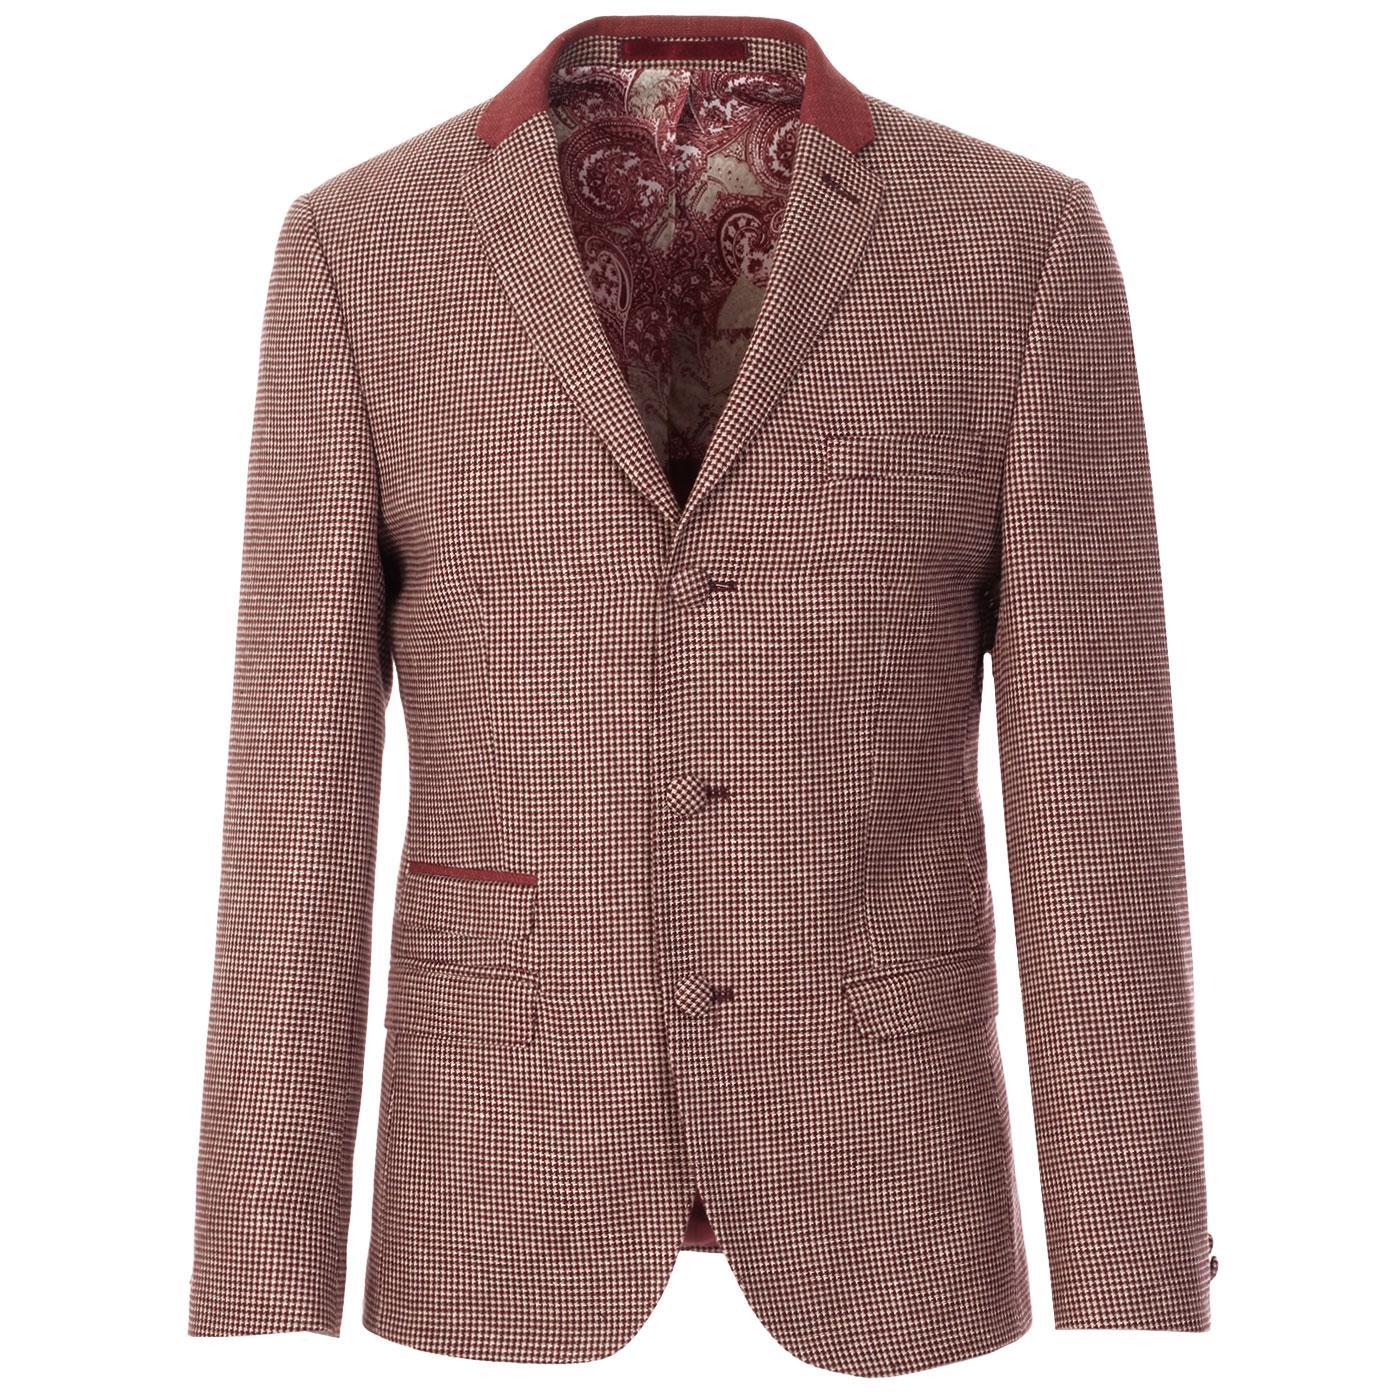 MADCAP ENGLAND Mod 3 Button Dogtooth Suit Jacket